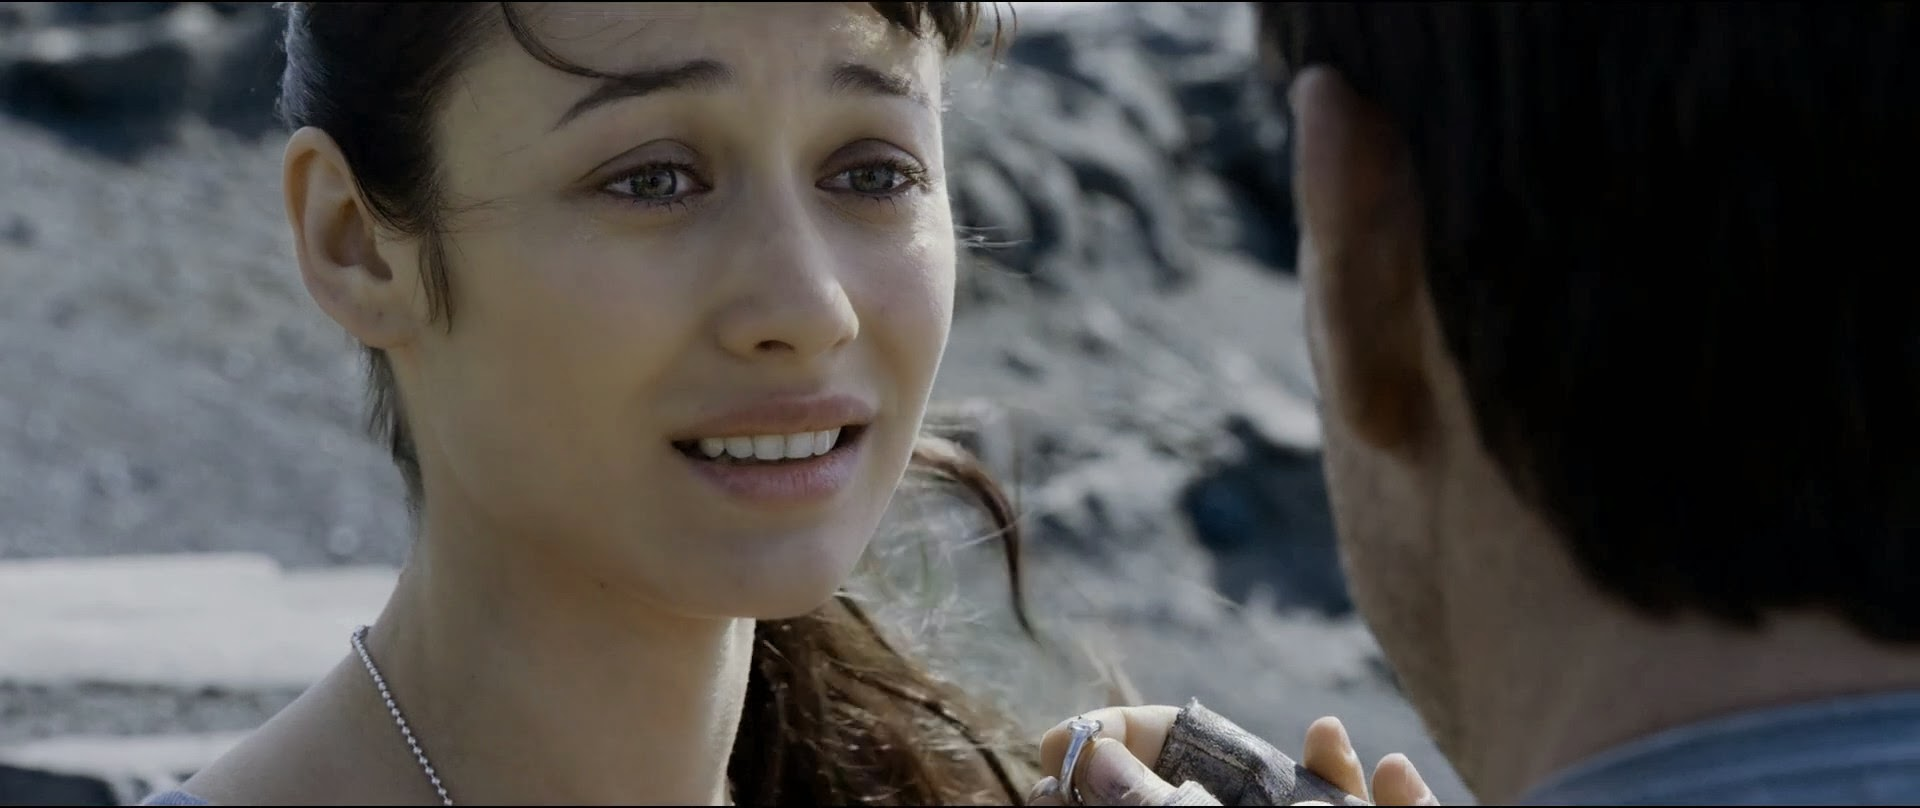 Oblivion (2013) BluRay 1080p 5.1CH x264 Ganool_0012